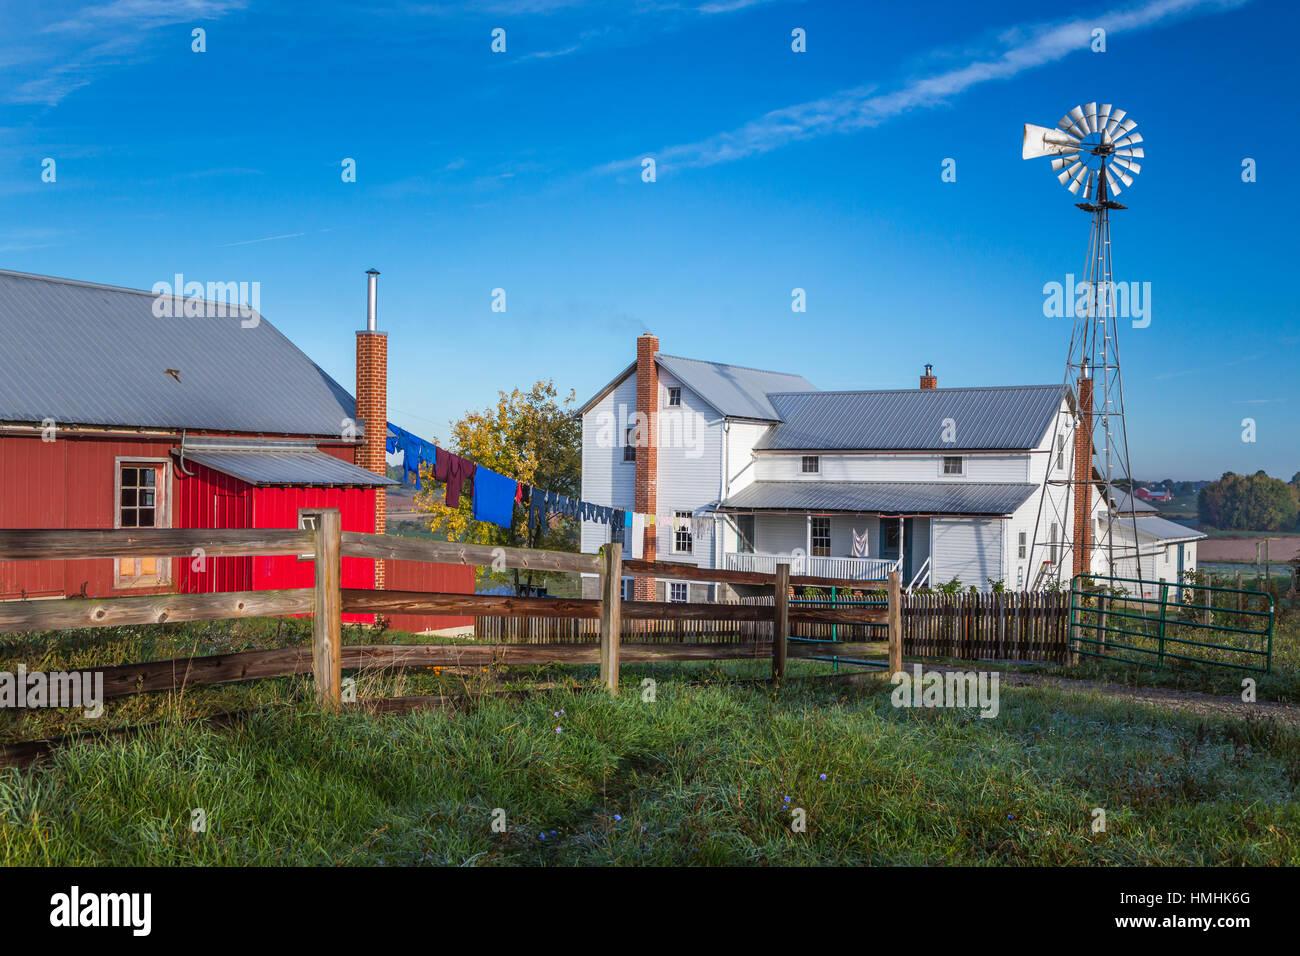 Apple Creek Imágenes De Stock   Apple Creek Fotos De Stock - Alamy 53799dd8d26